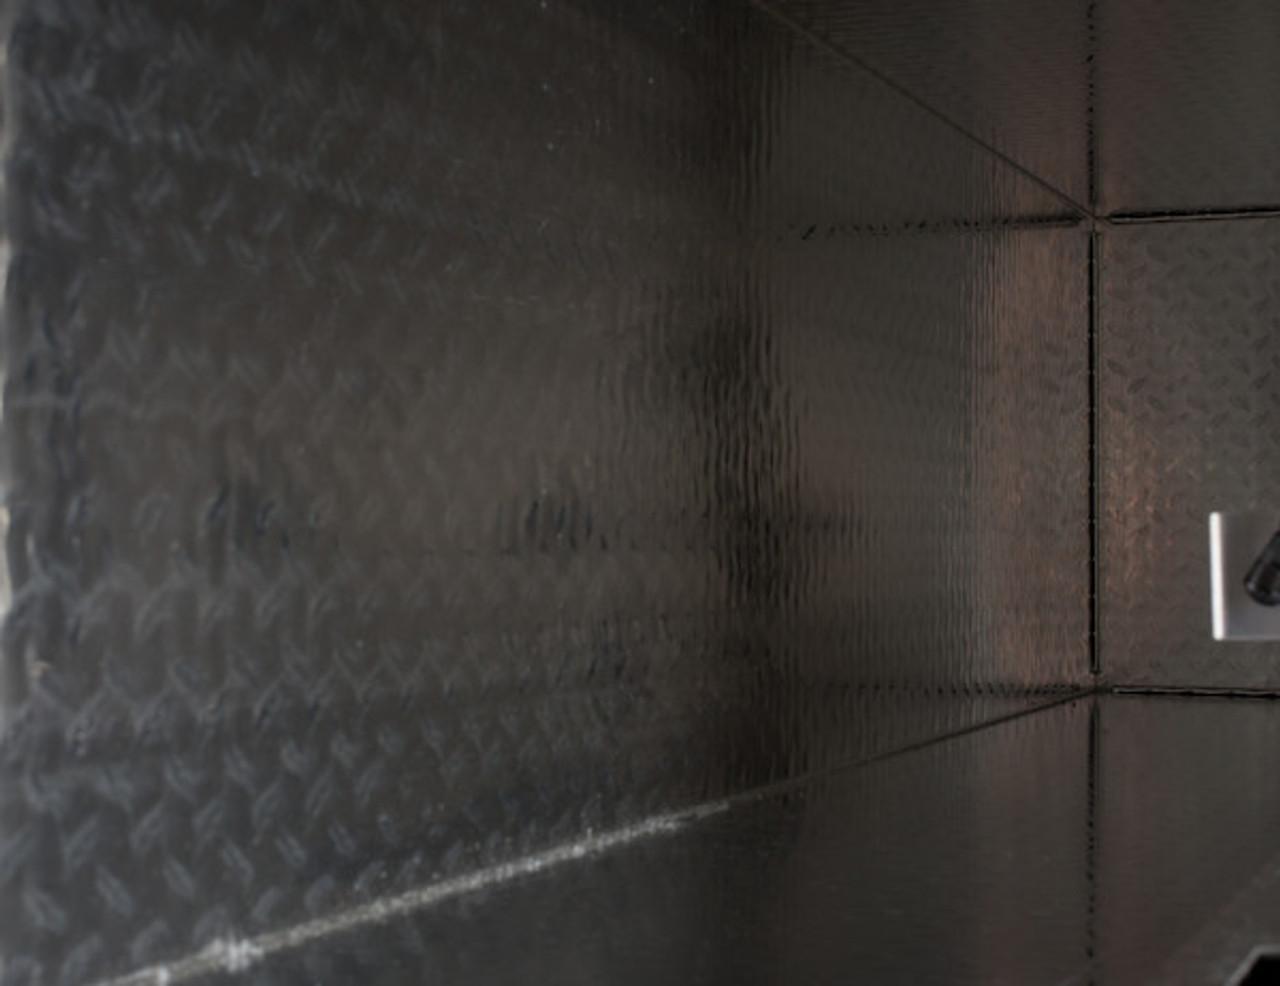 "1701768 BUYERS PRODUCTS DIAMOND TREAD ALUMINUM TOPSIDER TRUCK TOOLBOX WITH FLIP-UP DOOR 18""HX16""DX96""W"